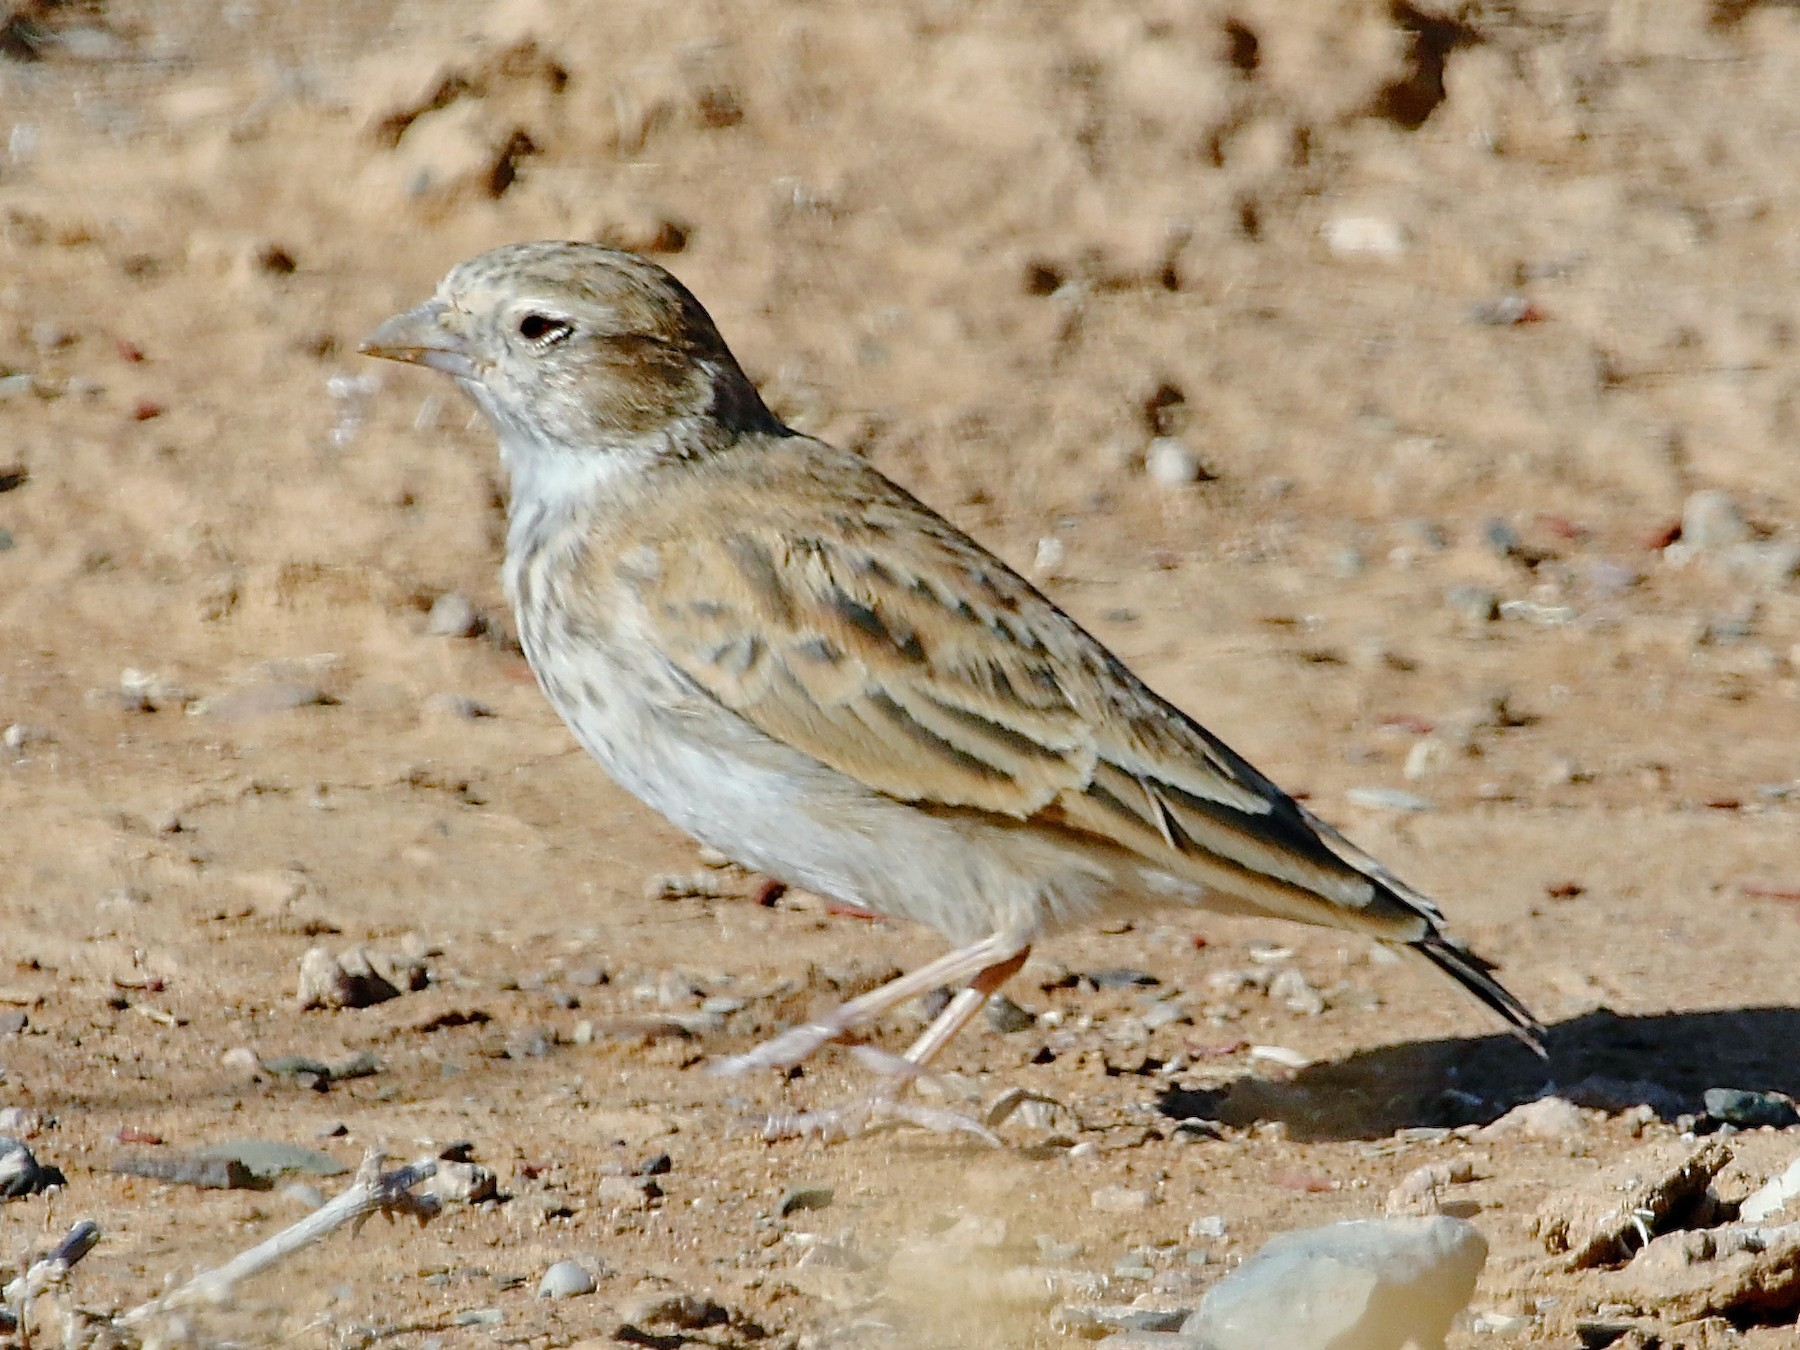 Black-eared Sparrow-Lark - Gil Ewing